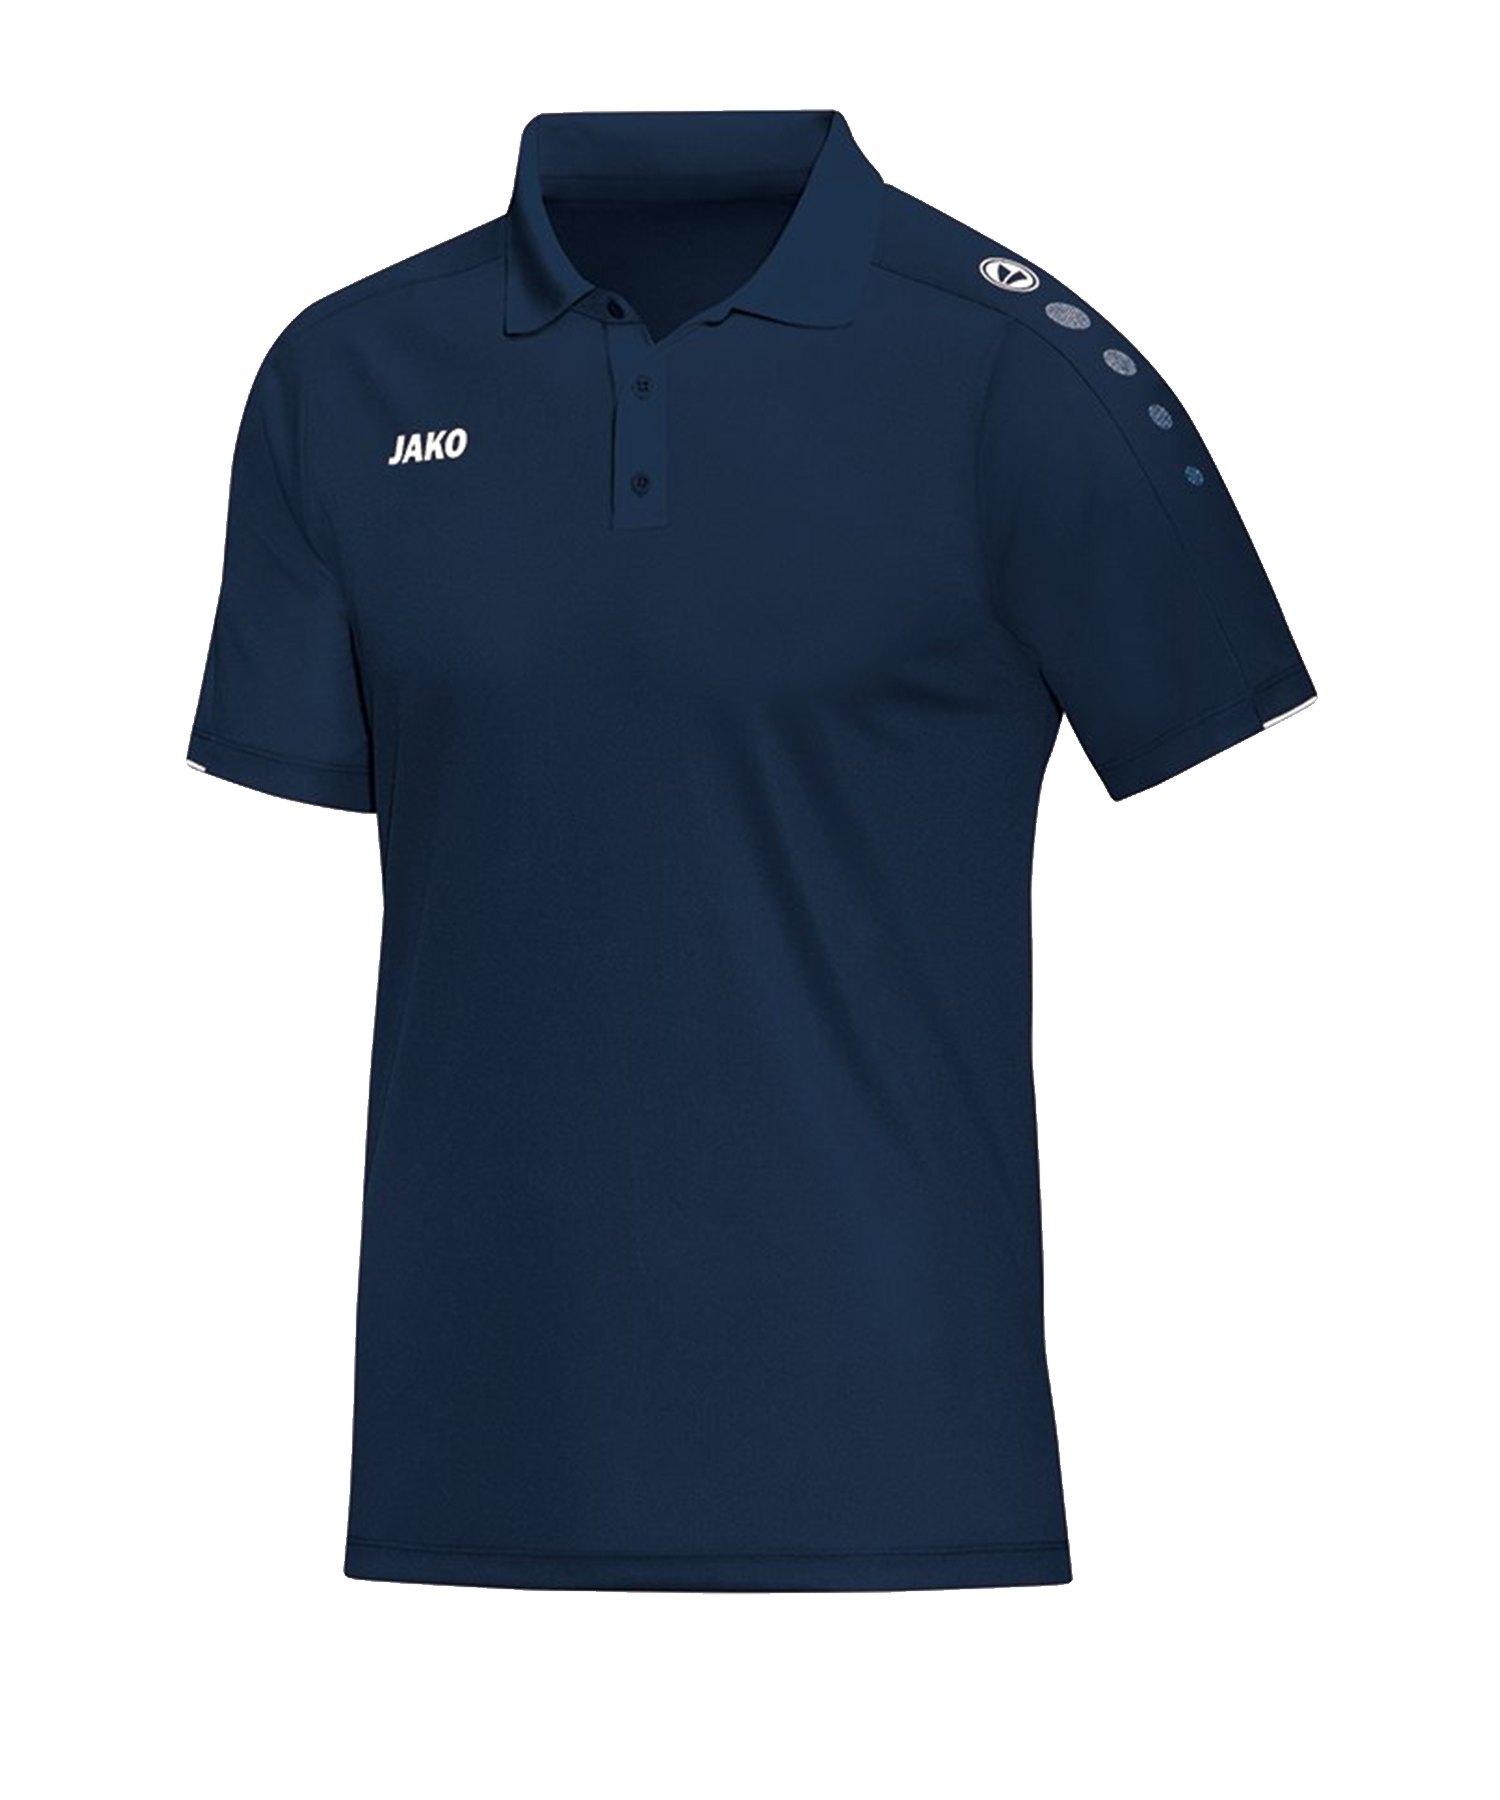 Jako Classico Poloshirt Blau F09 - Blau